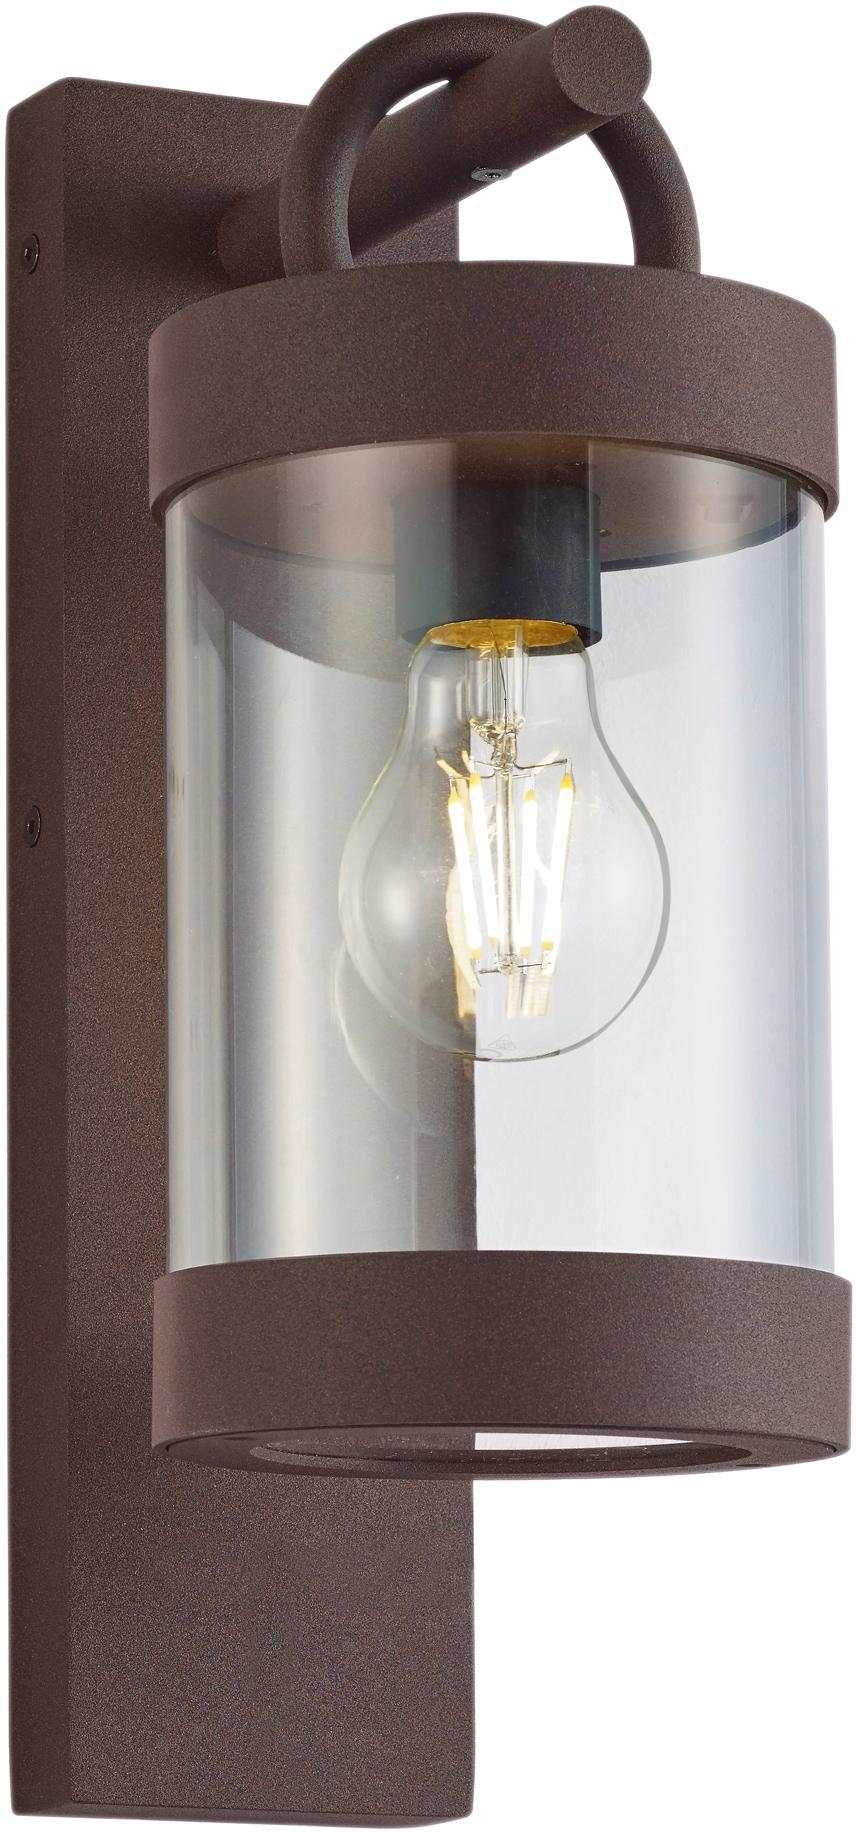 TRIO Leuchten Außen-Wandleuchte Sambesi, E27, Dämmerungssensor, Leuchtmittel tauschbar